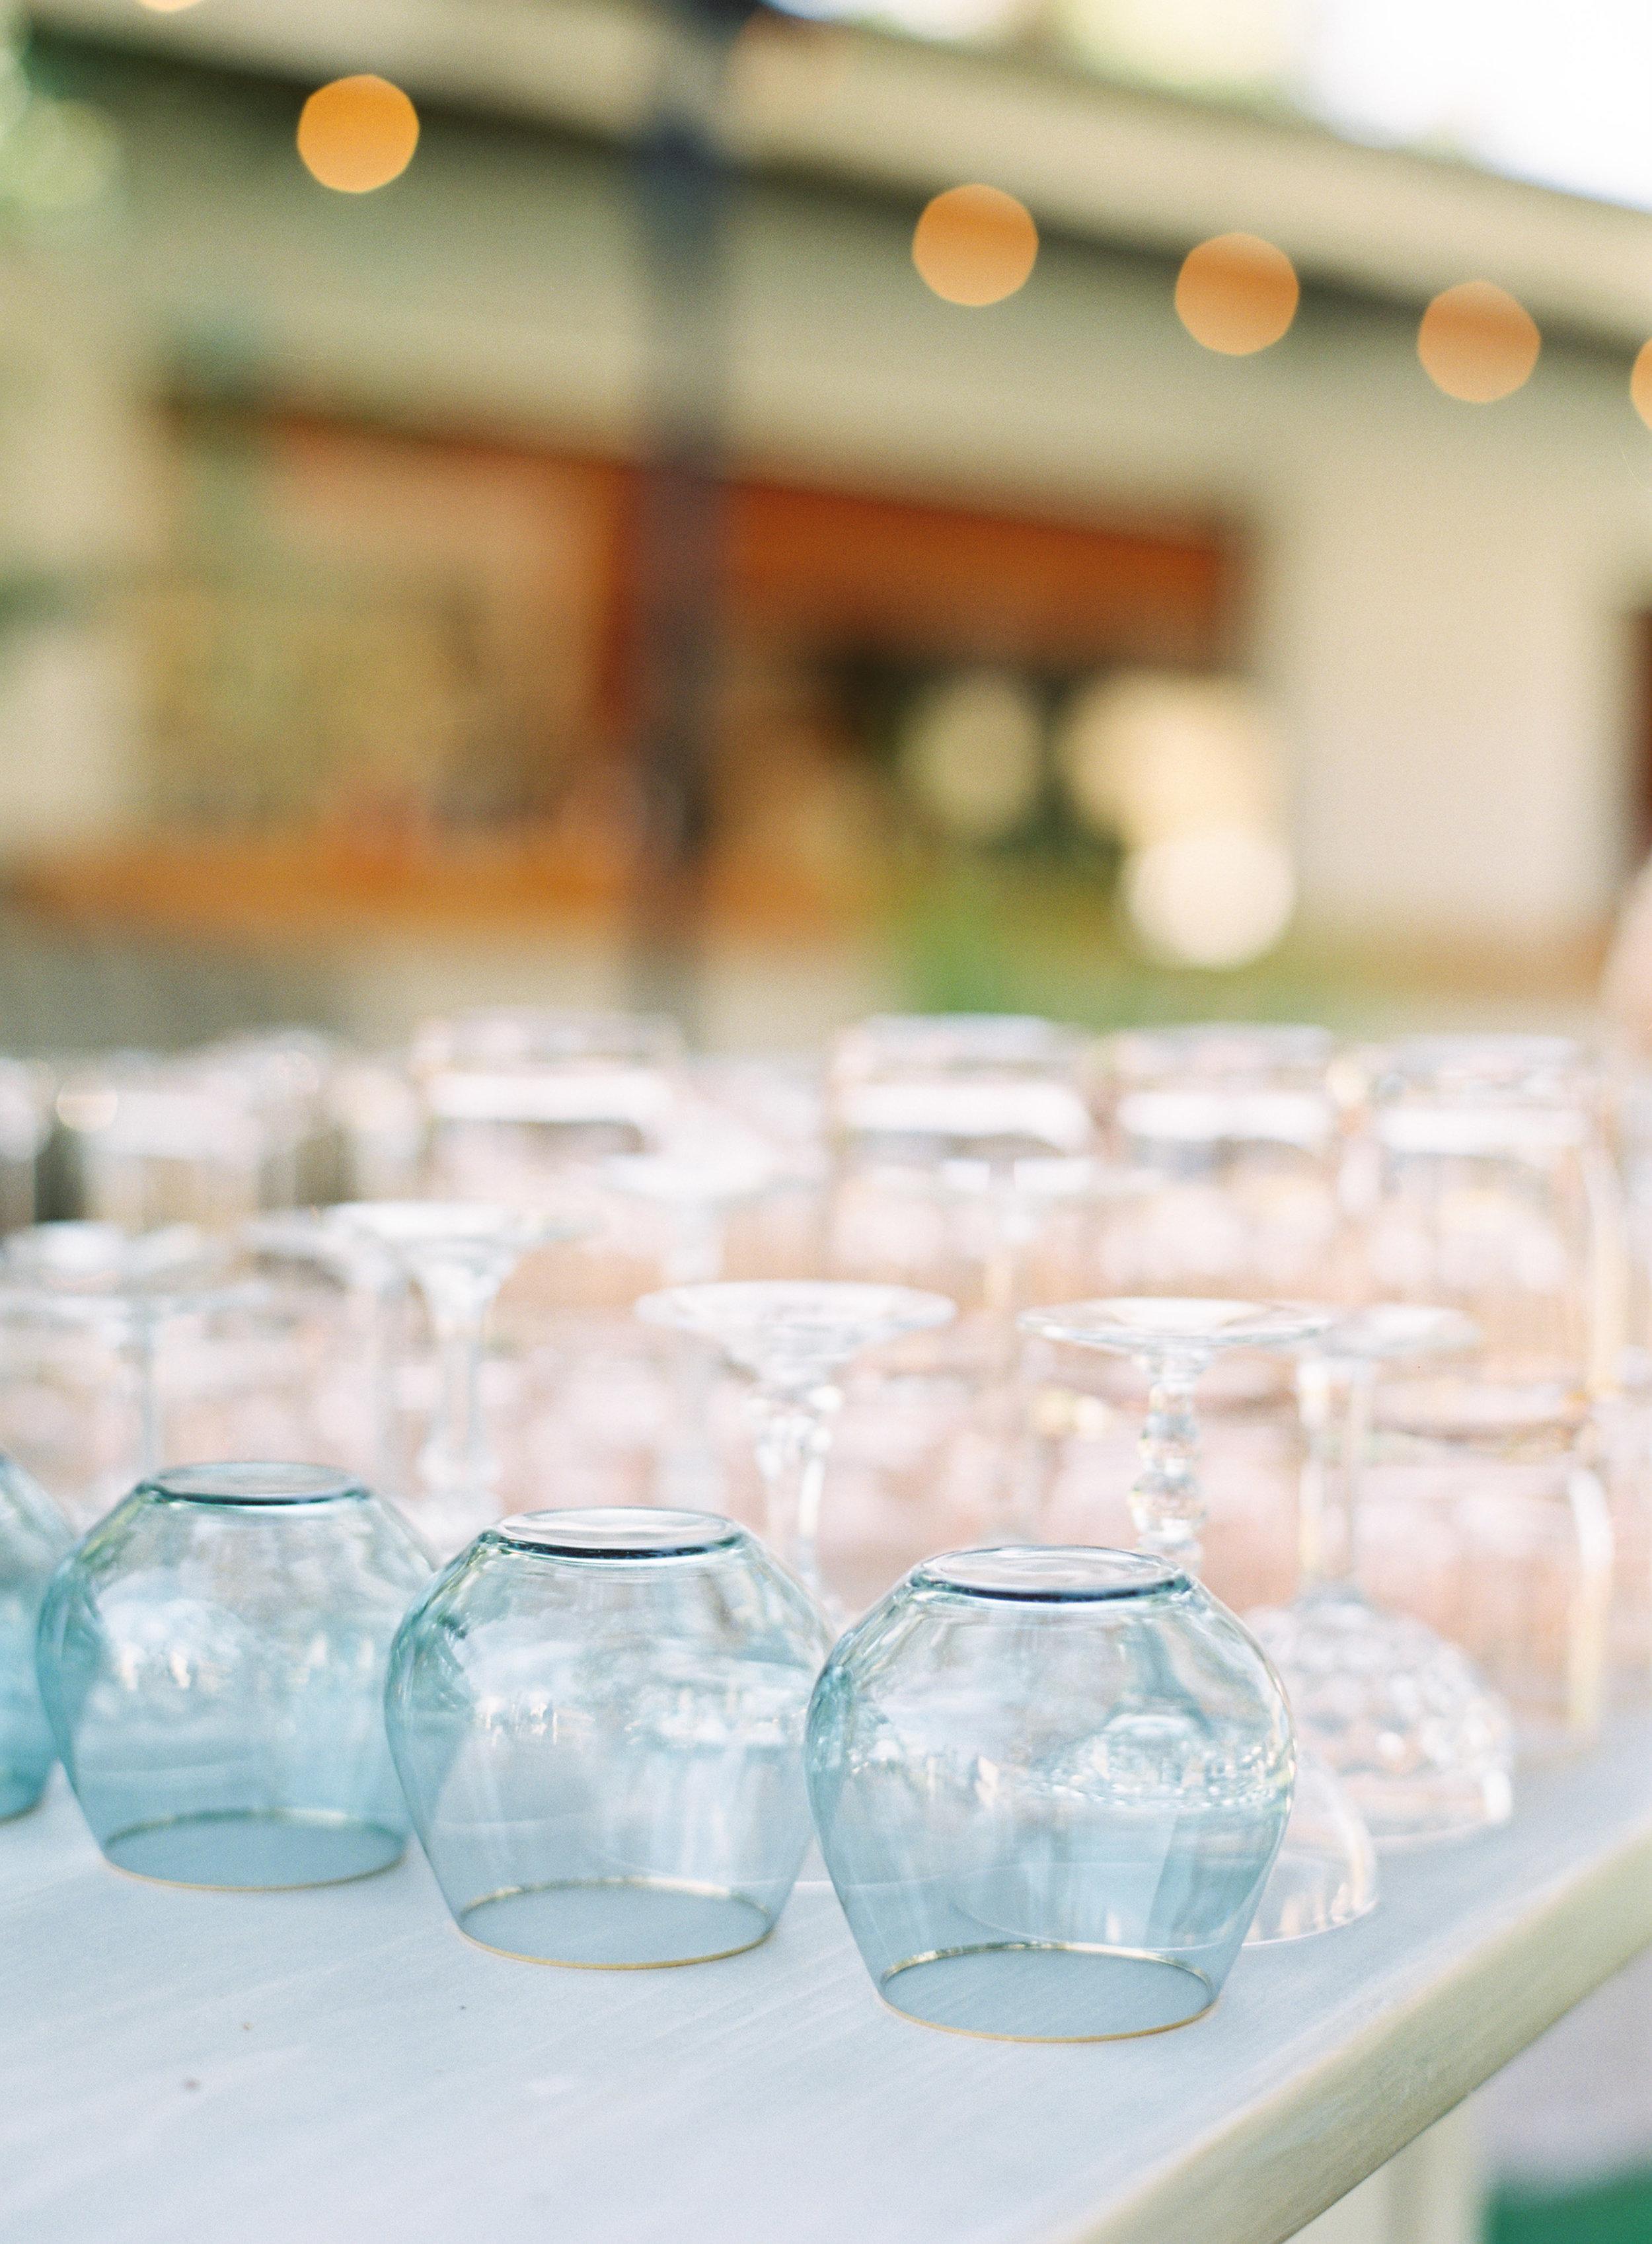 Triunfo_Creek_Winery_Wedding-156-Jen-Huang-JL-300-Jen-Huang-009963-R1-003.jpg